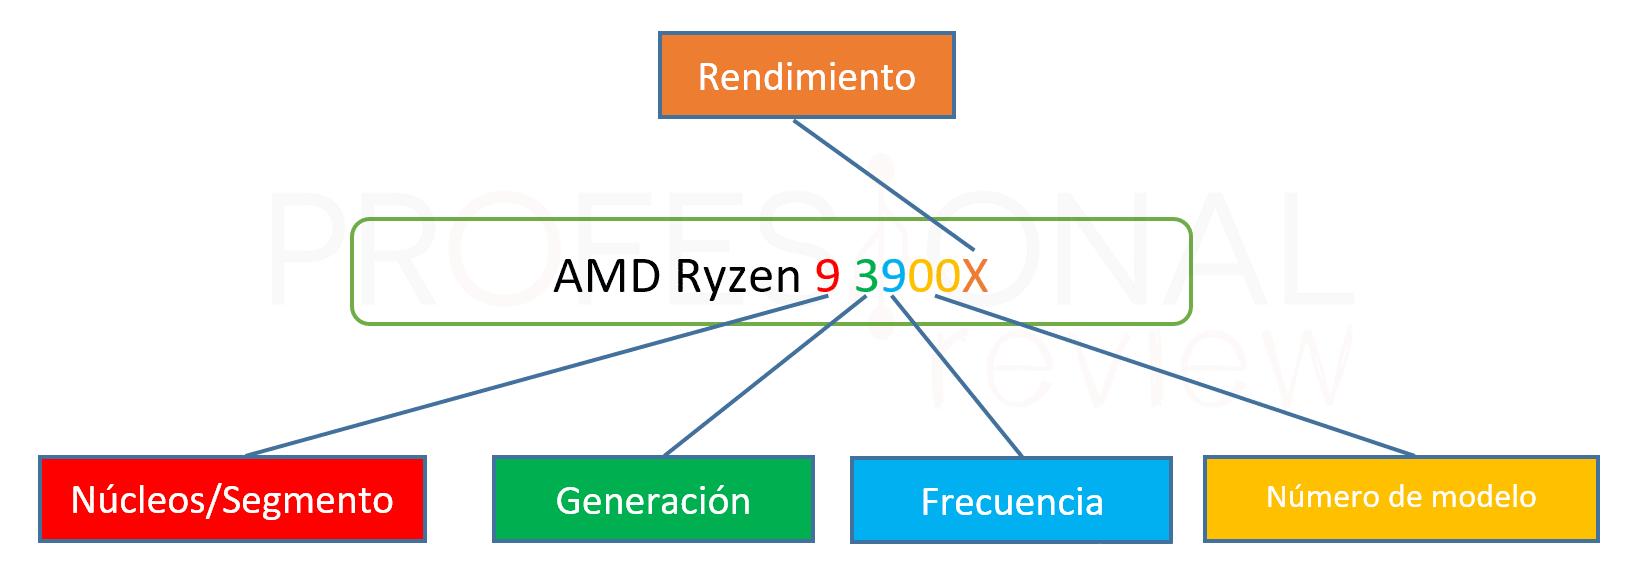 Procesador AMD nomenclatura Ryzen